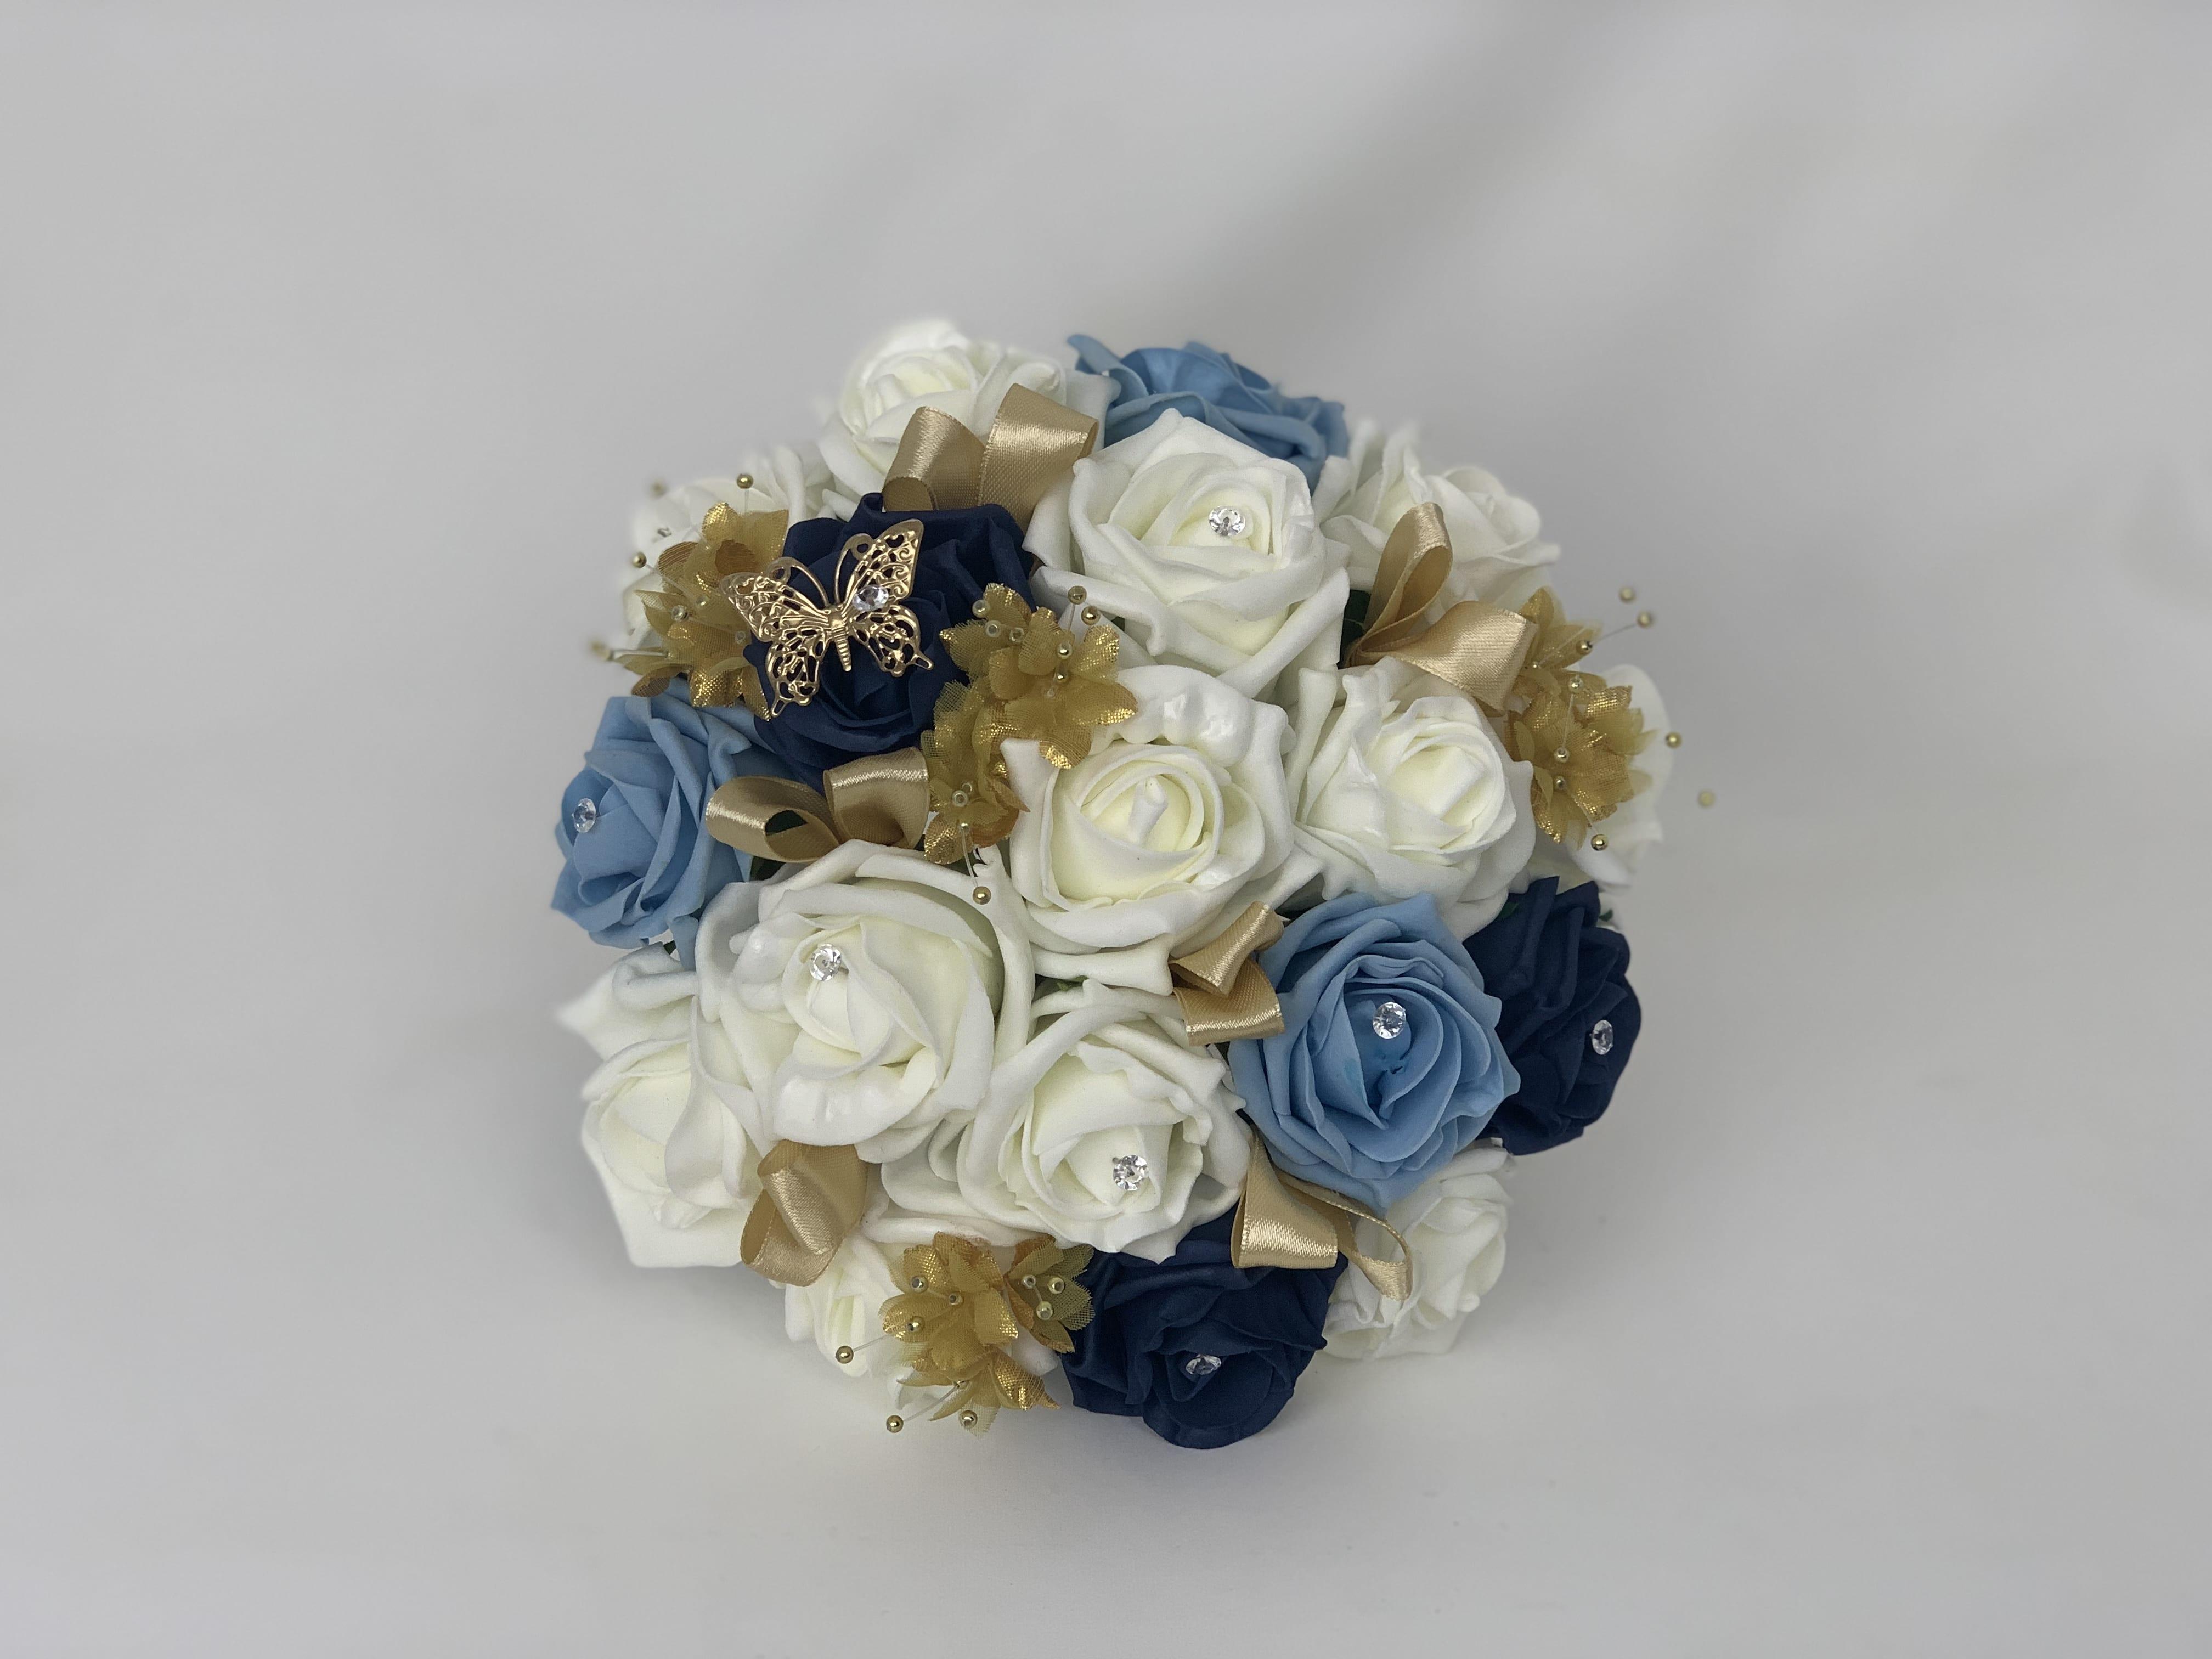 Medium Artificial Wedding Flowers Bridesmaid Bouquet Posy